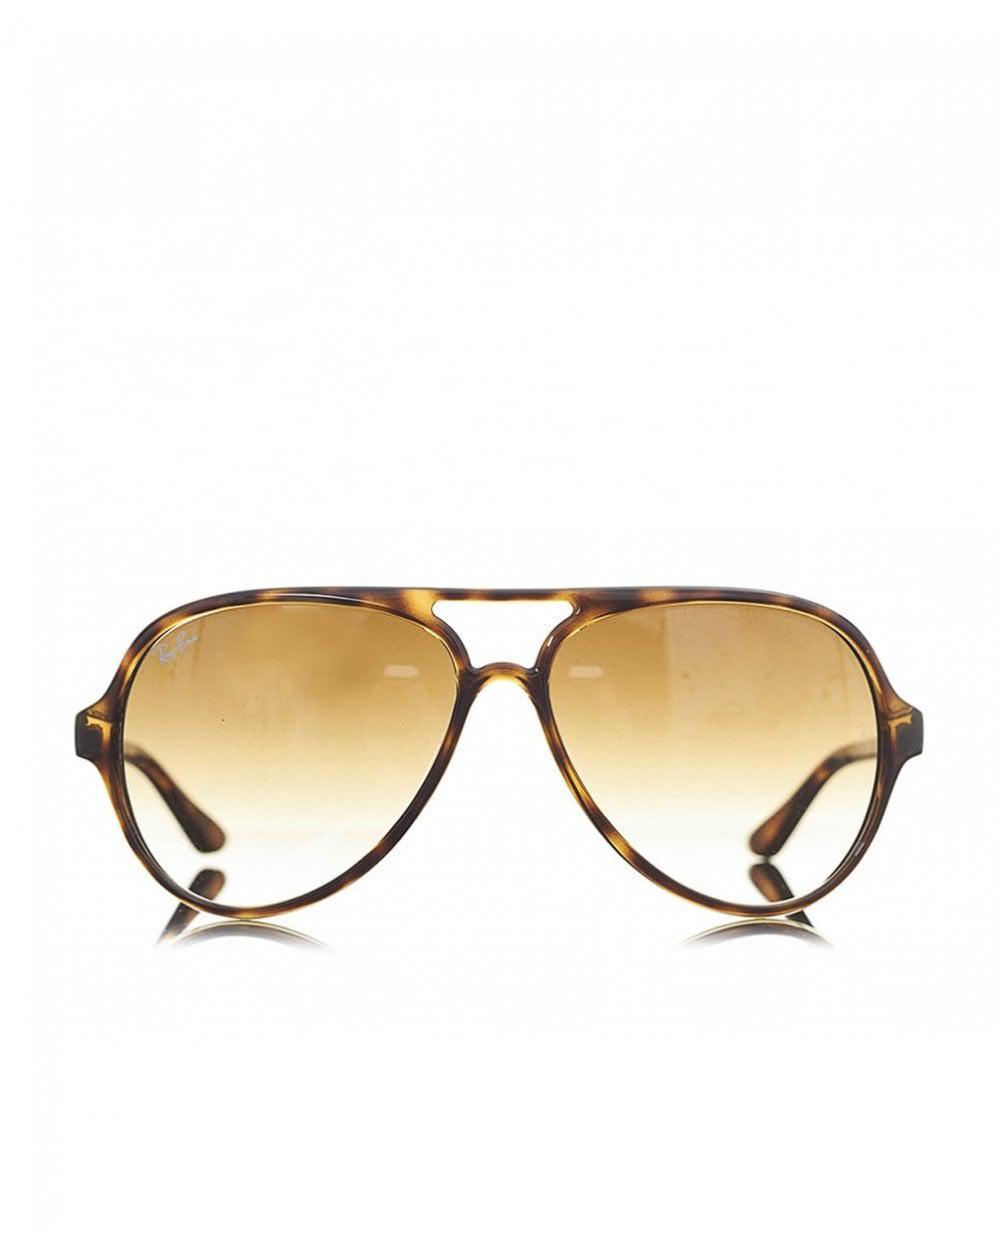 7602440c1b Ray-Ban Cat 5000 Sunglasses for Men - Lyst